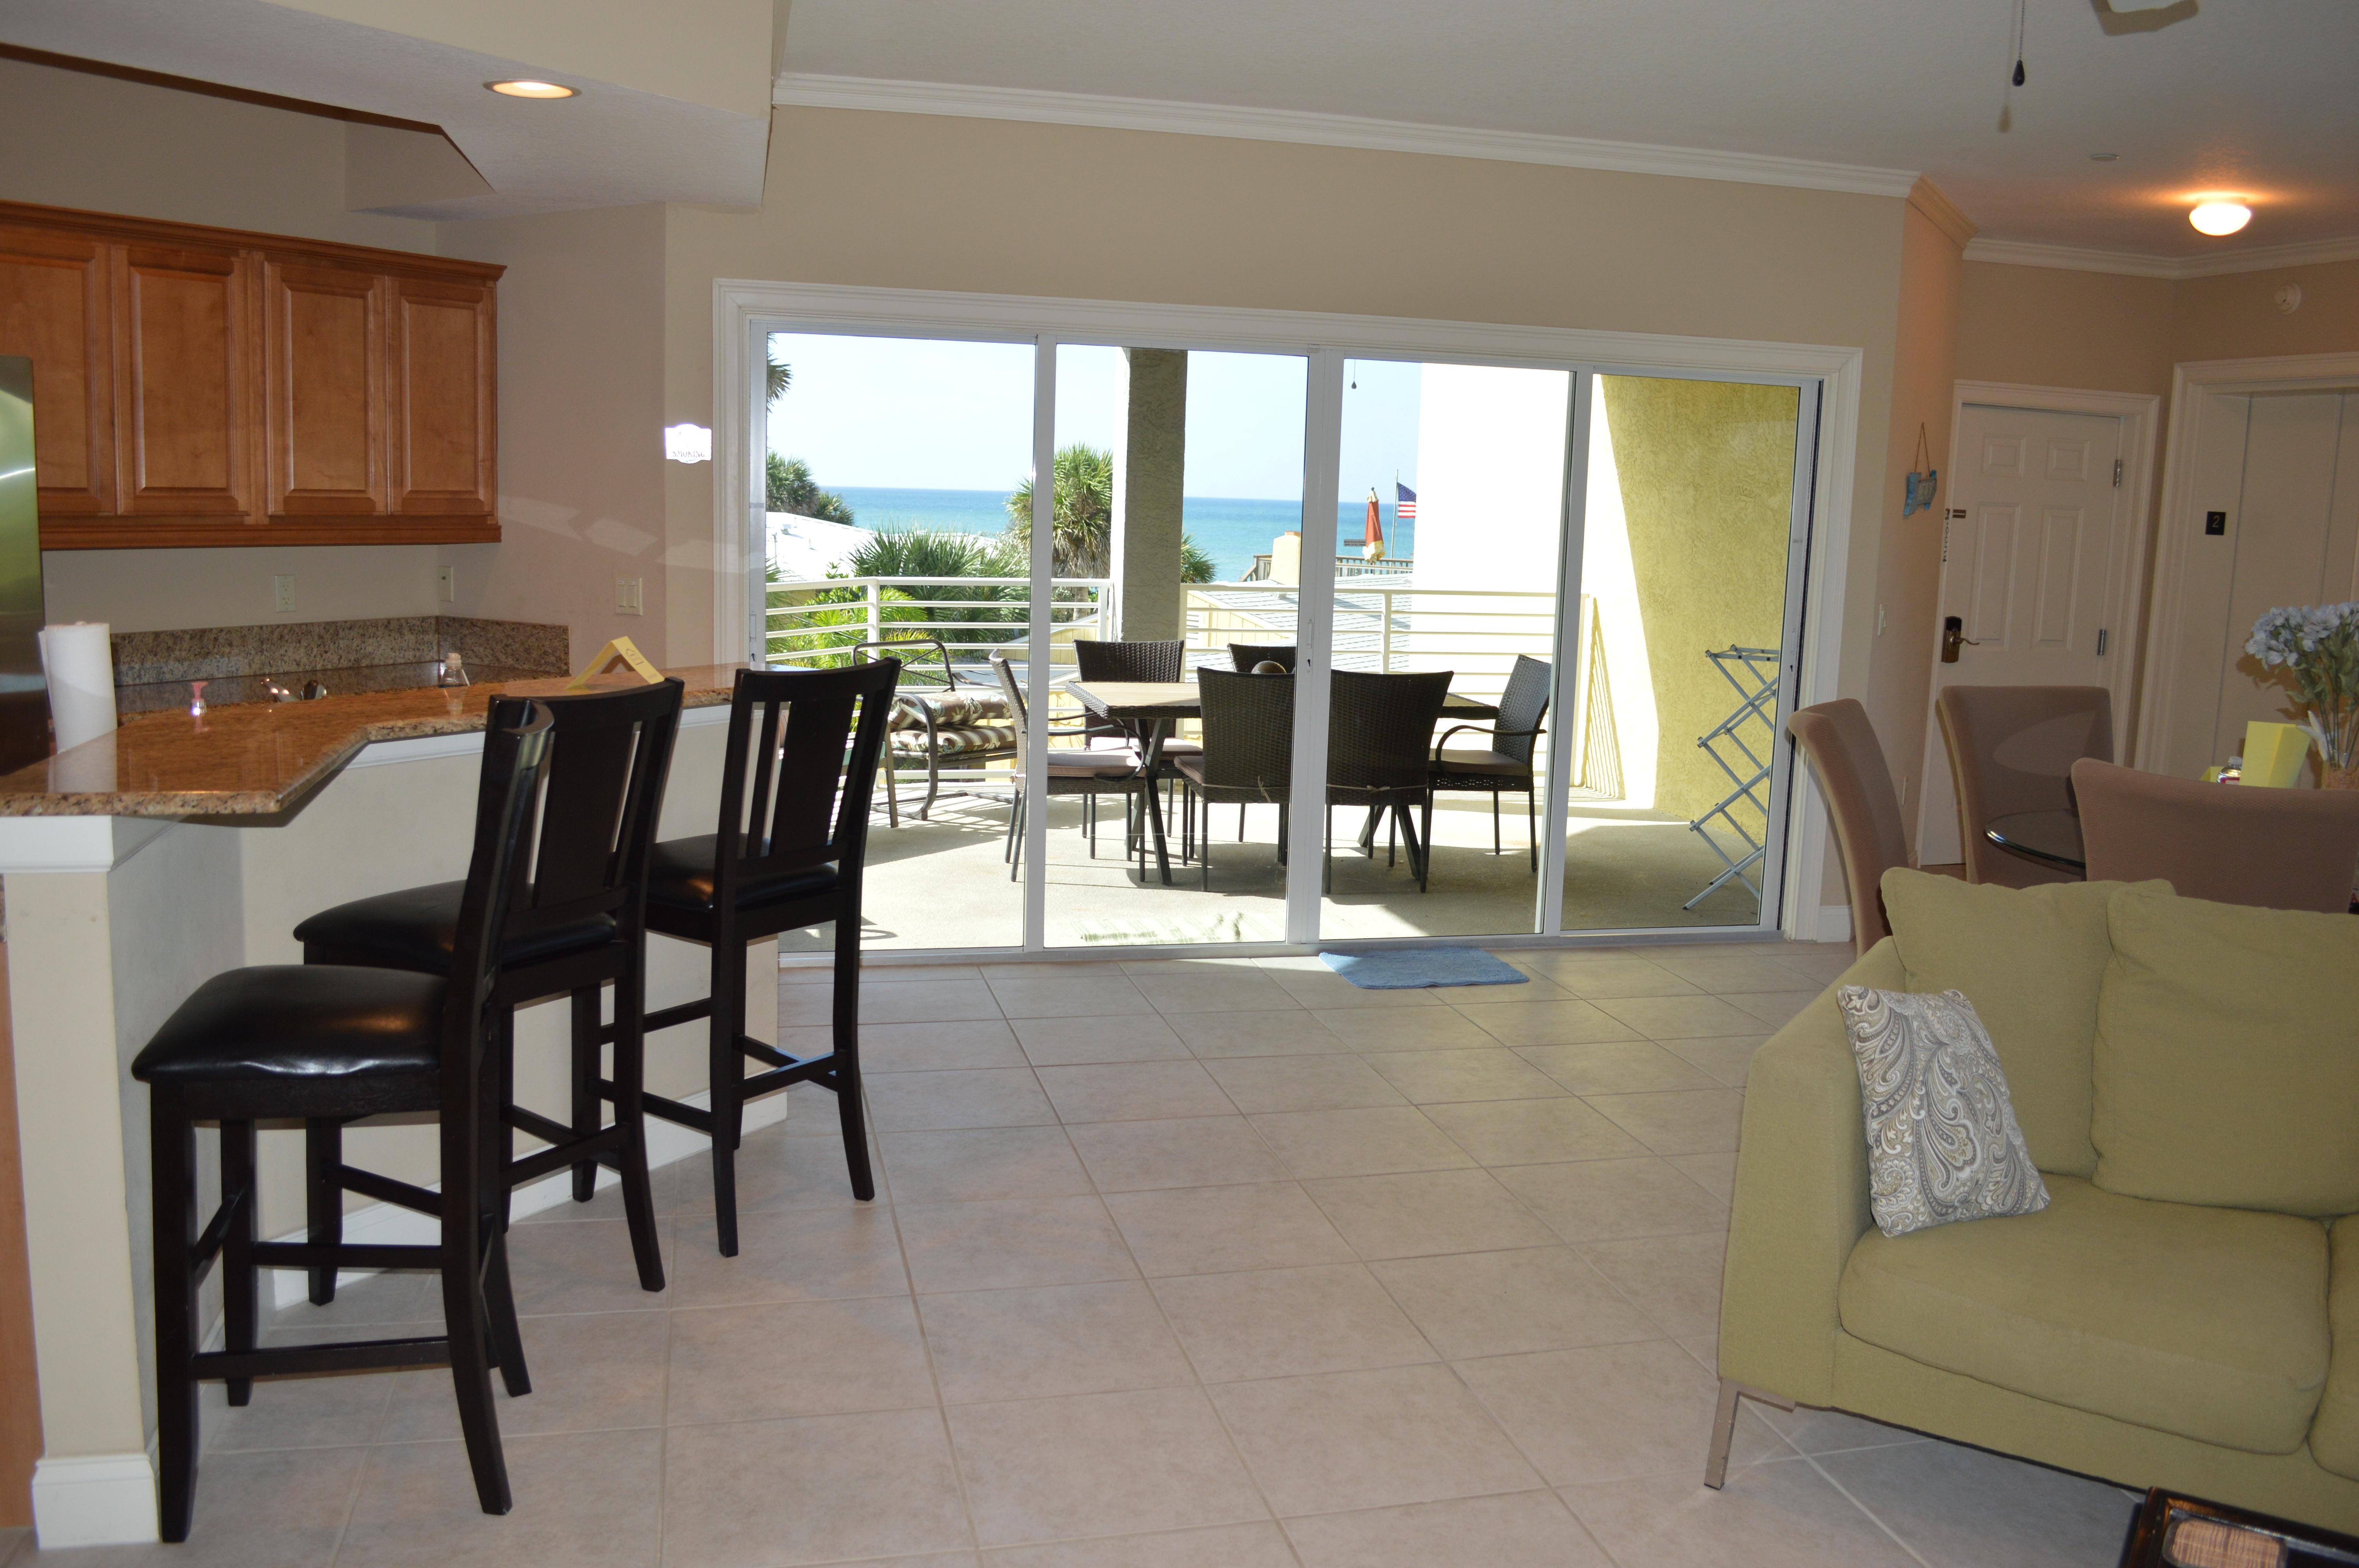 Englewood Beach Condo B | Englewood Beach Vacation Rentals